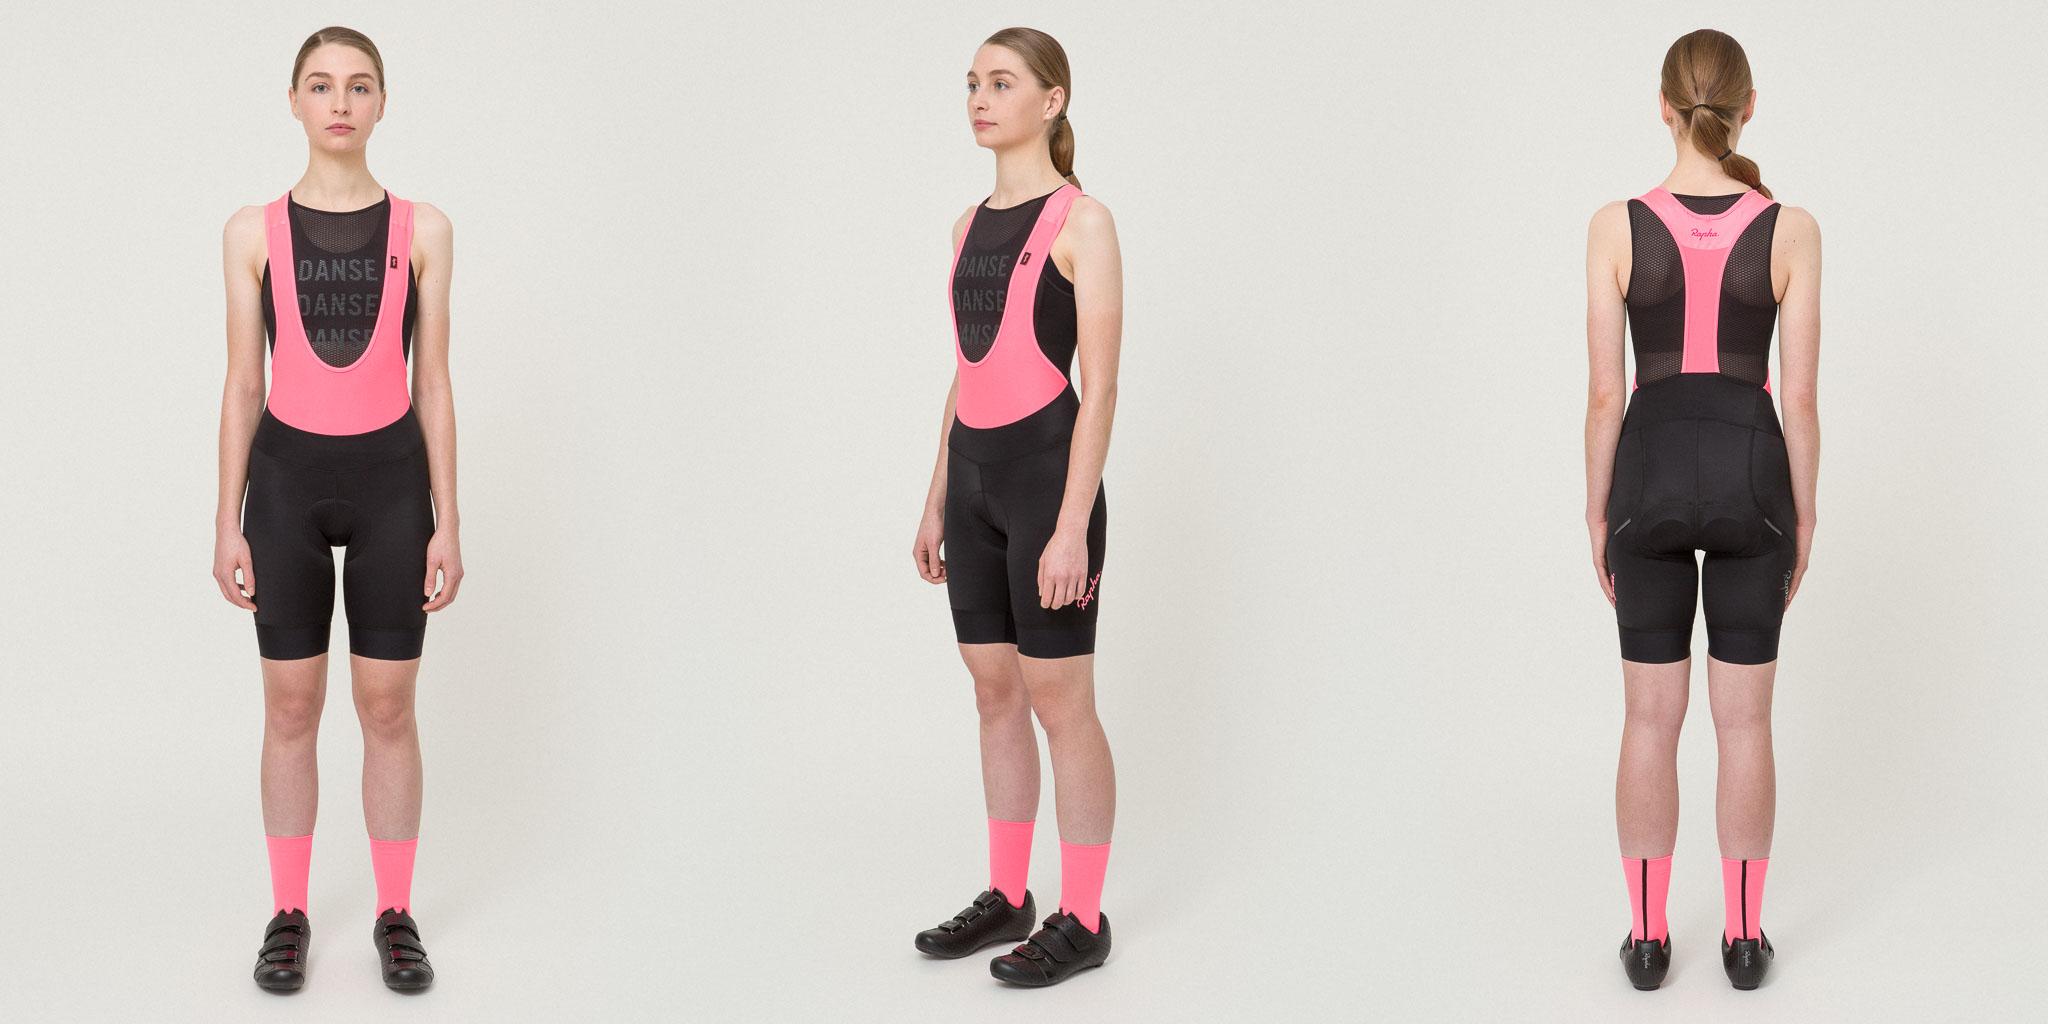 Rapha 2017 women's clothing range launched